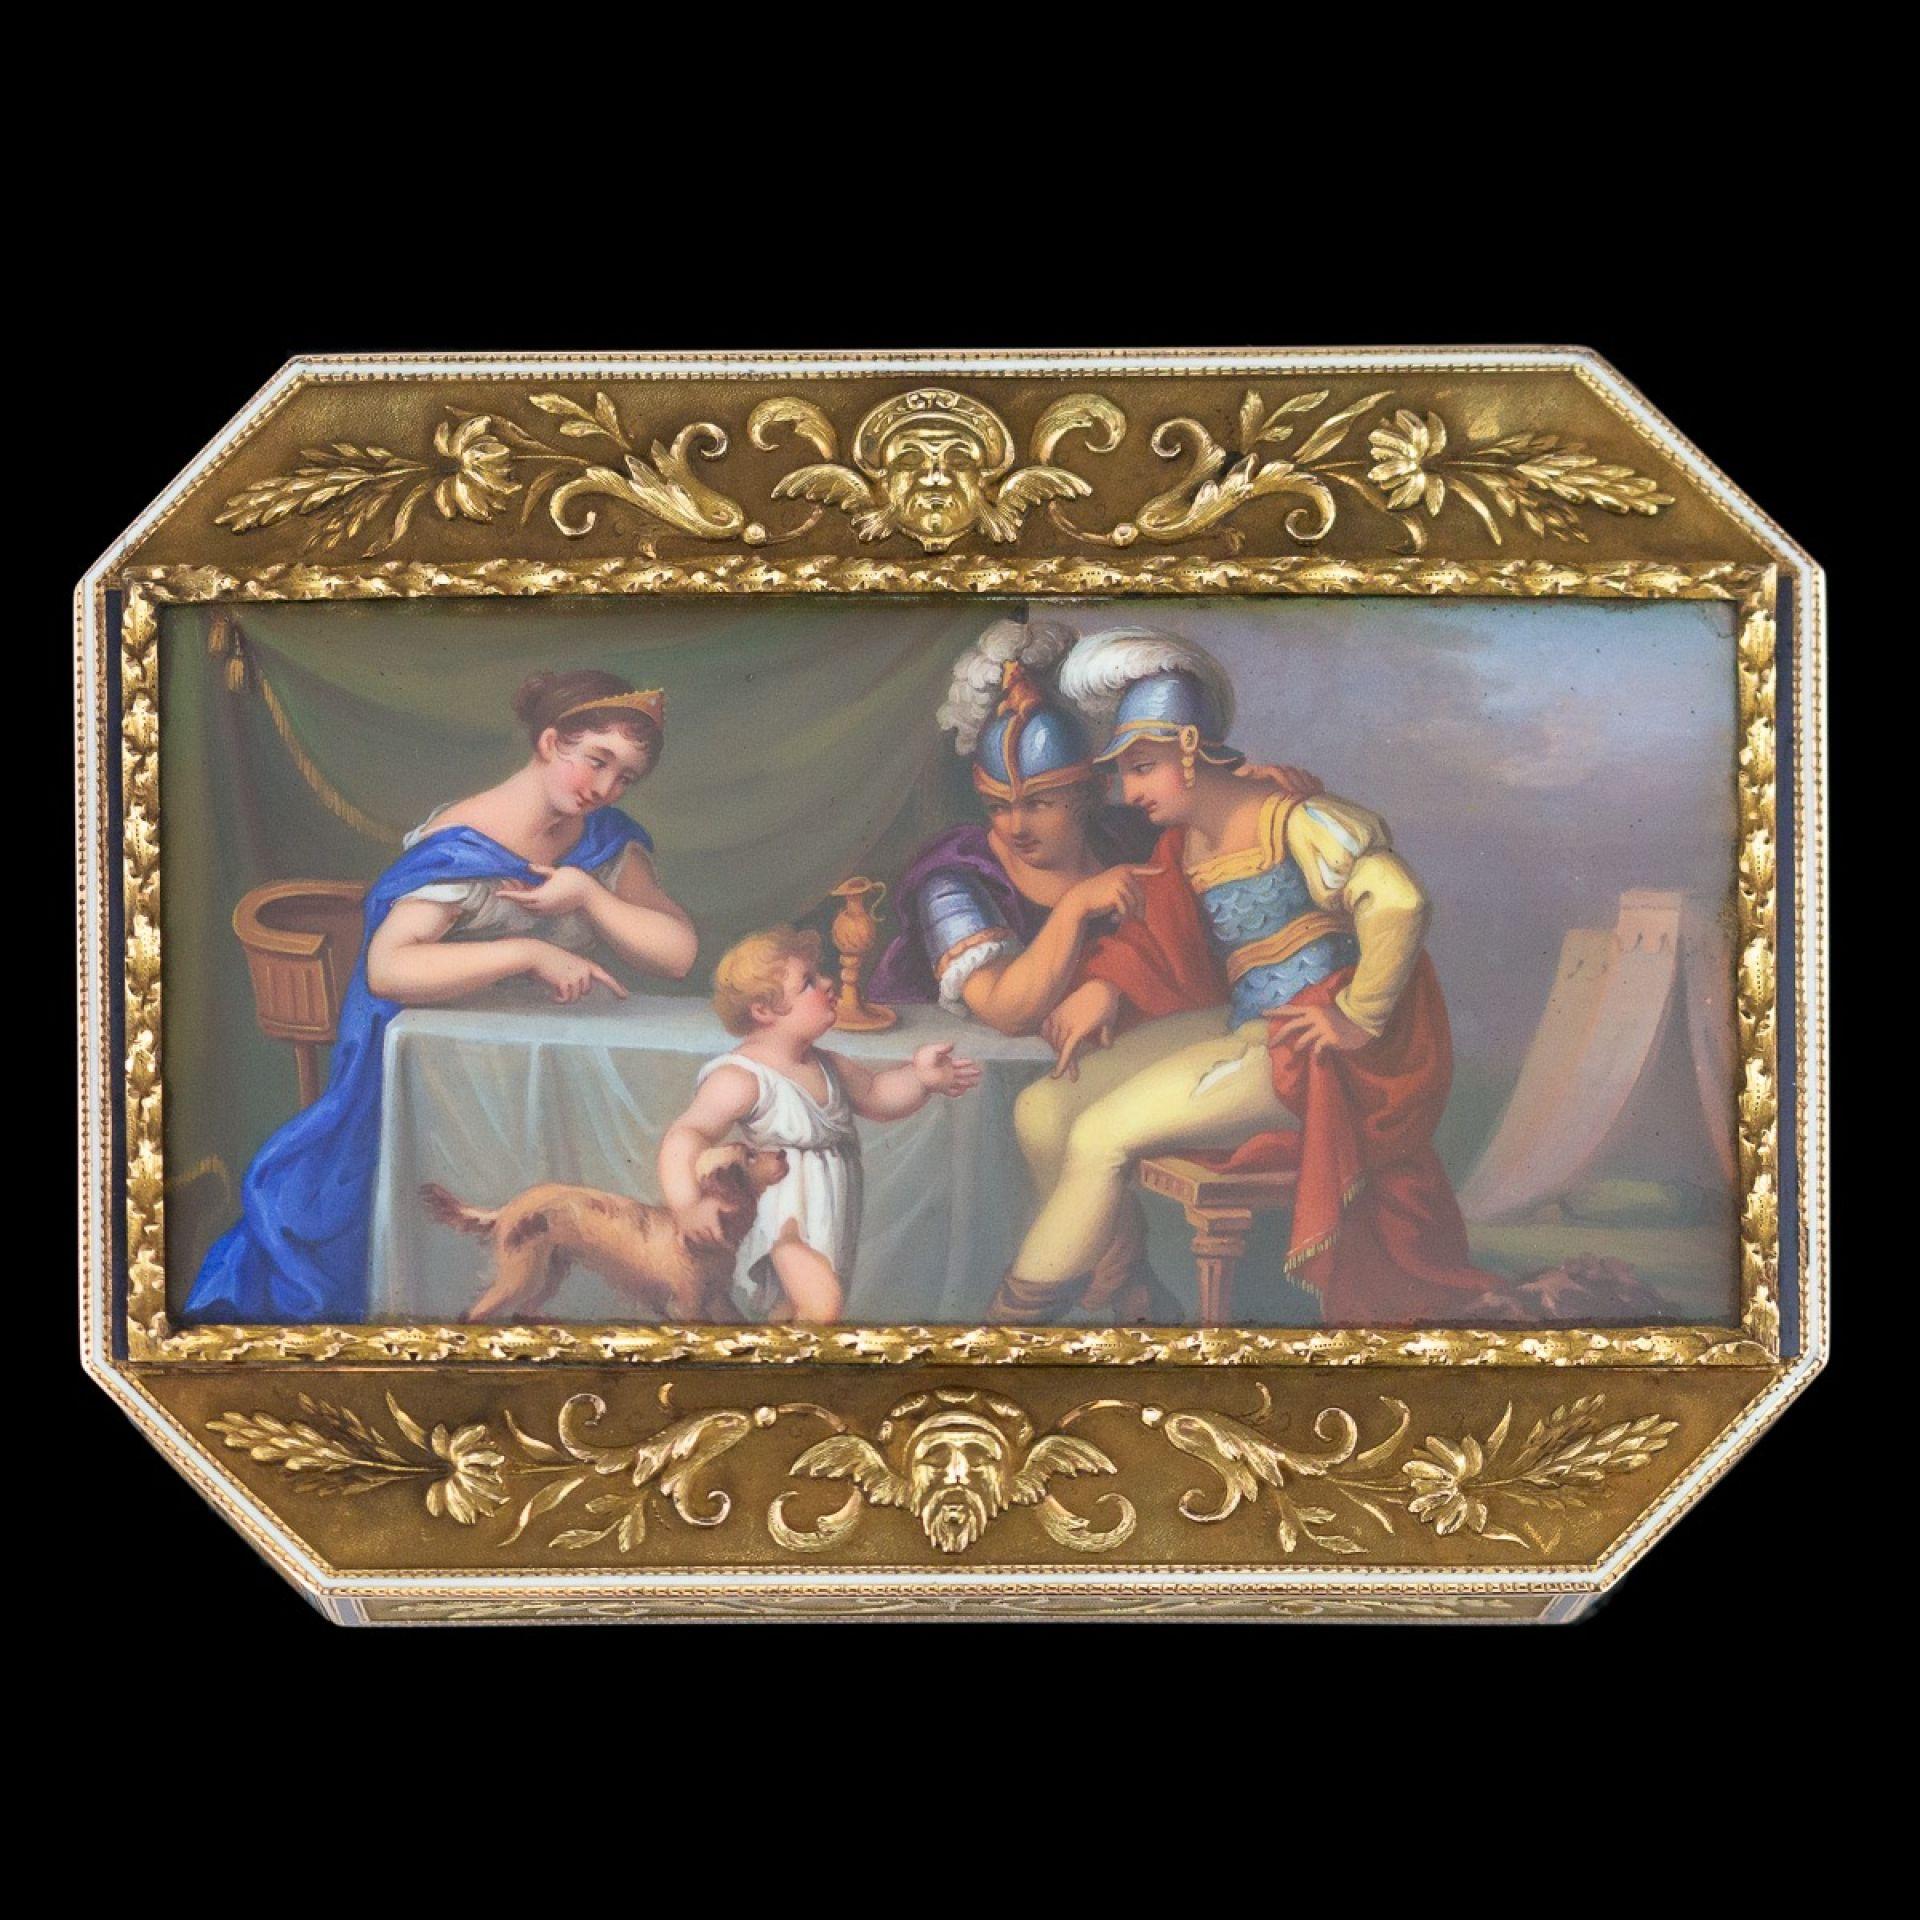 ANTIQUE 19thC SWISS 18K GOLD & ENAMEL SNUFF BOX c.1800